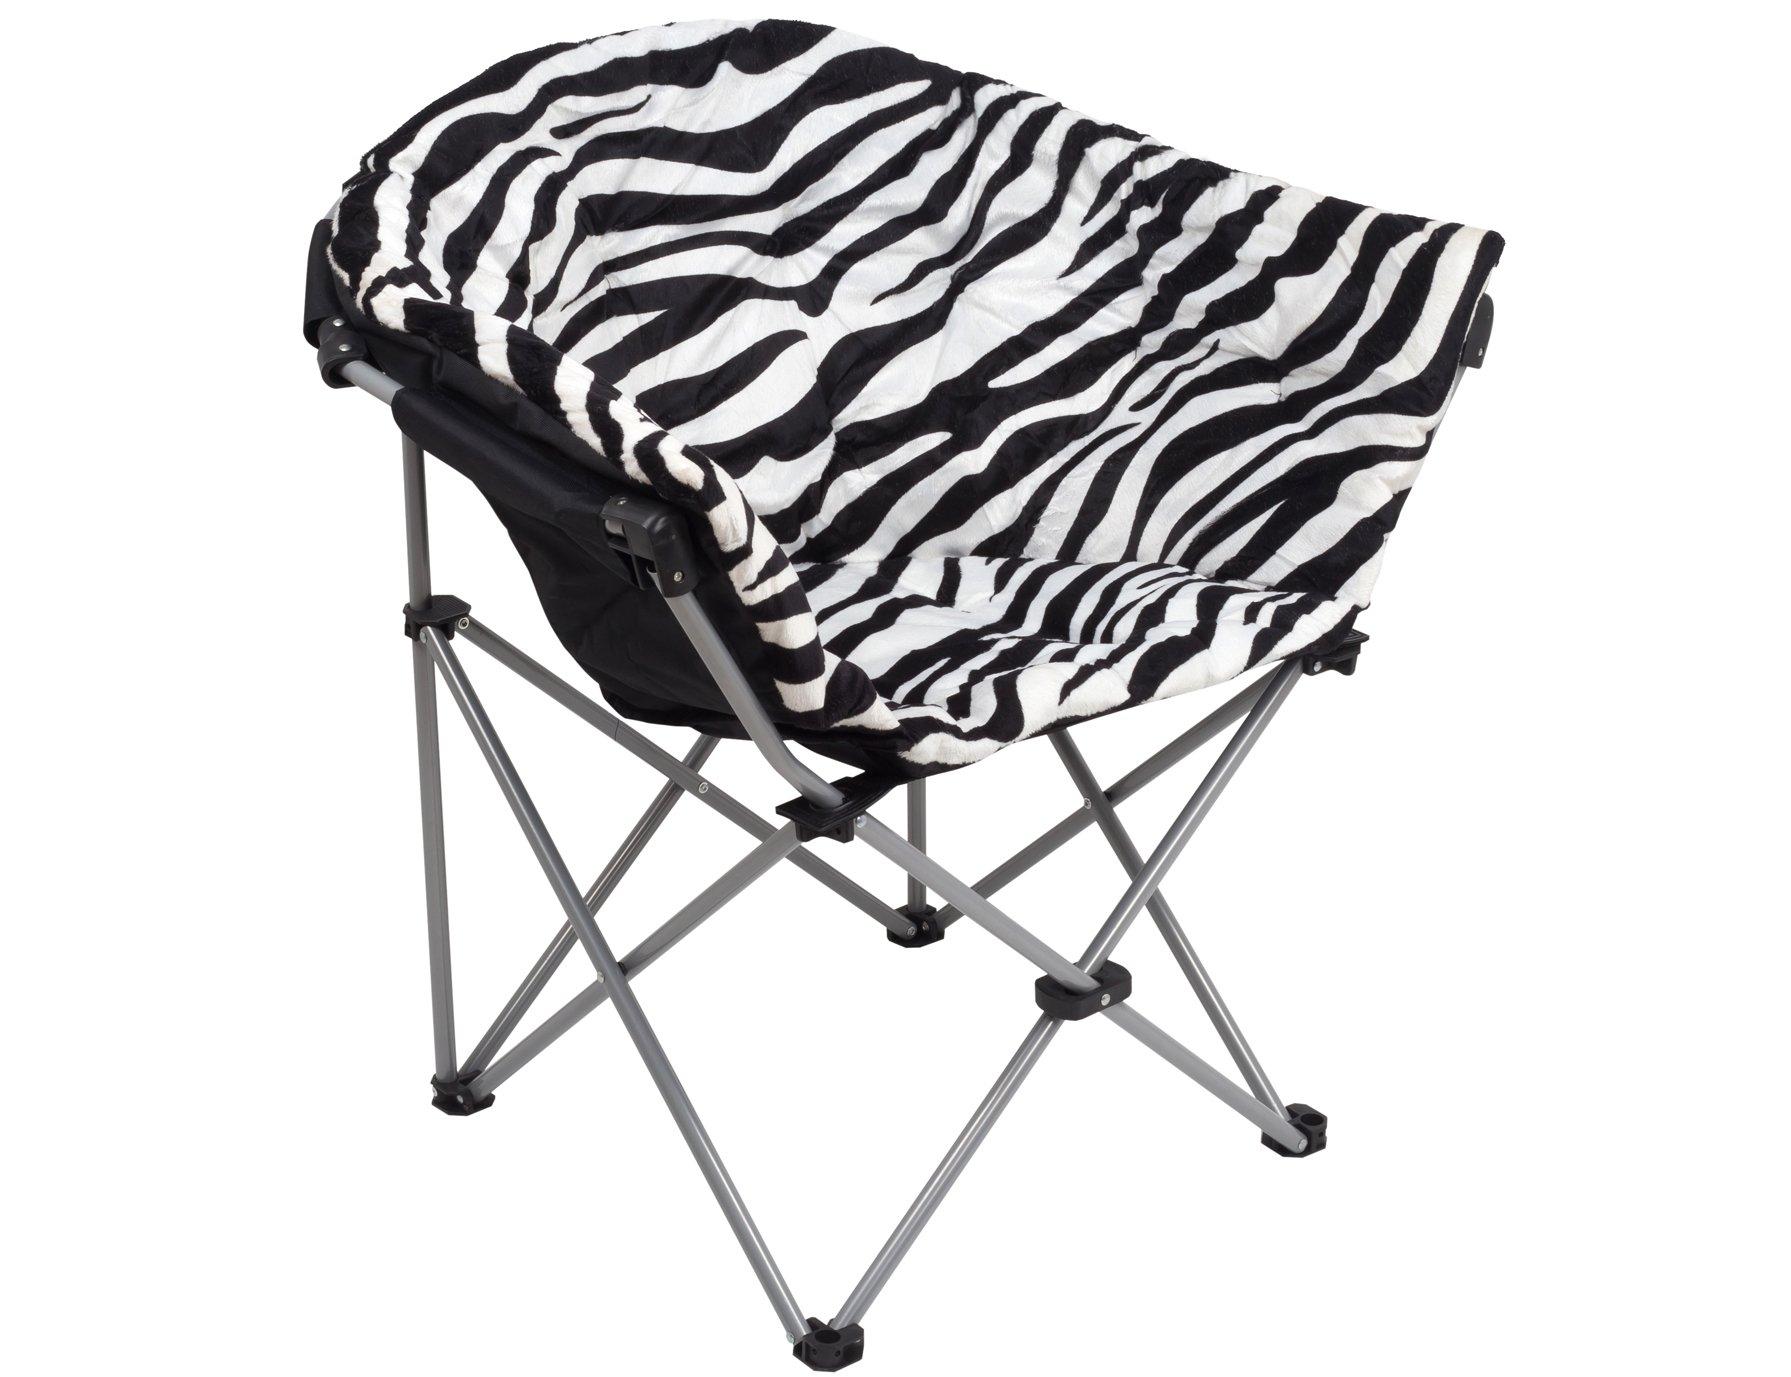 GOJOOASIS Folding Saucer Chair Moon Round Soft Comfortable Club Seat for TV Living Room Dorm (Zebra)